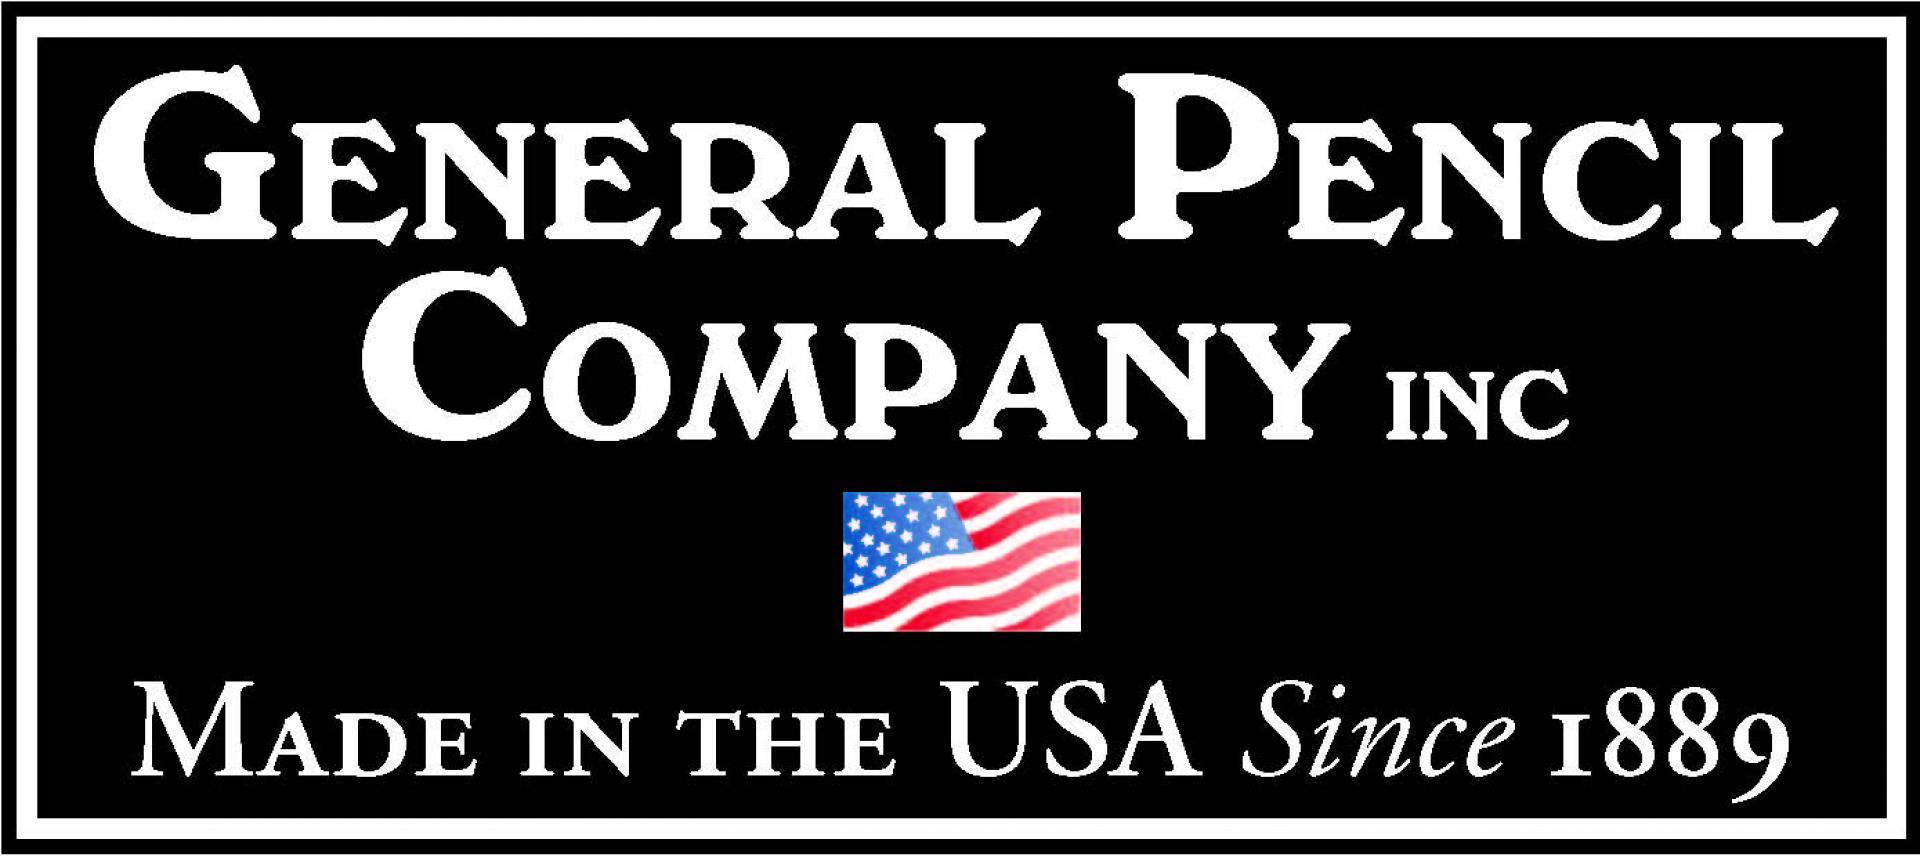 General Pencil Company